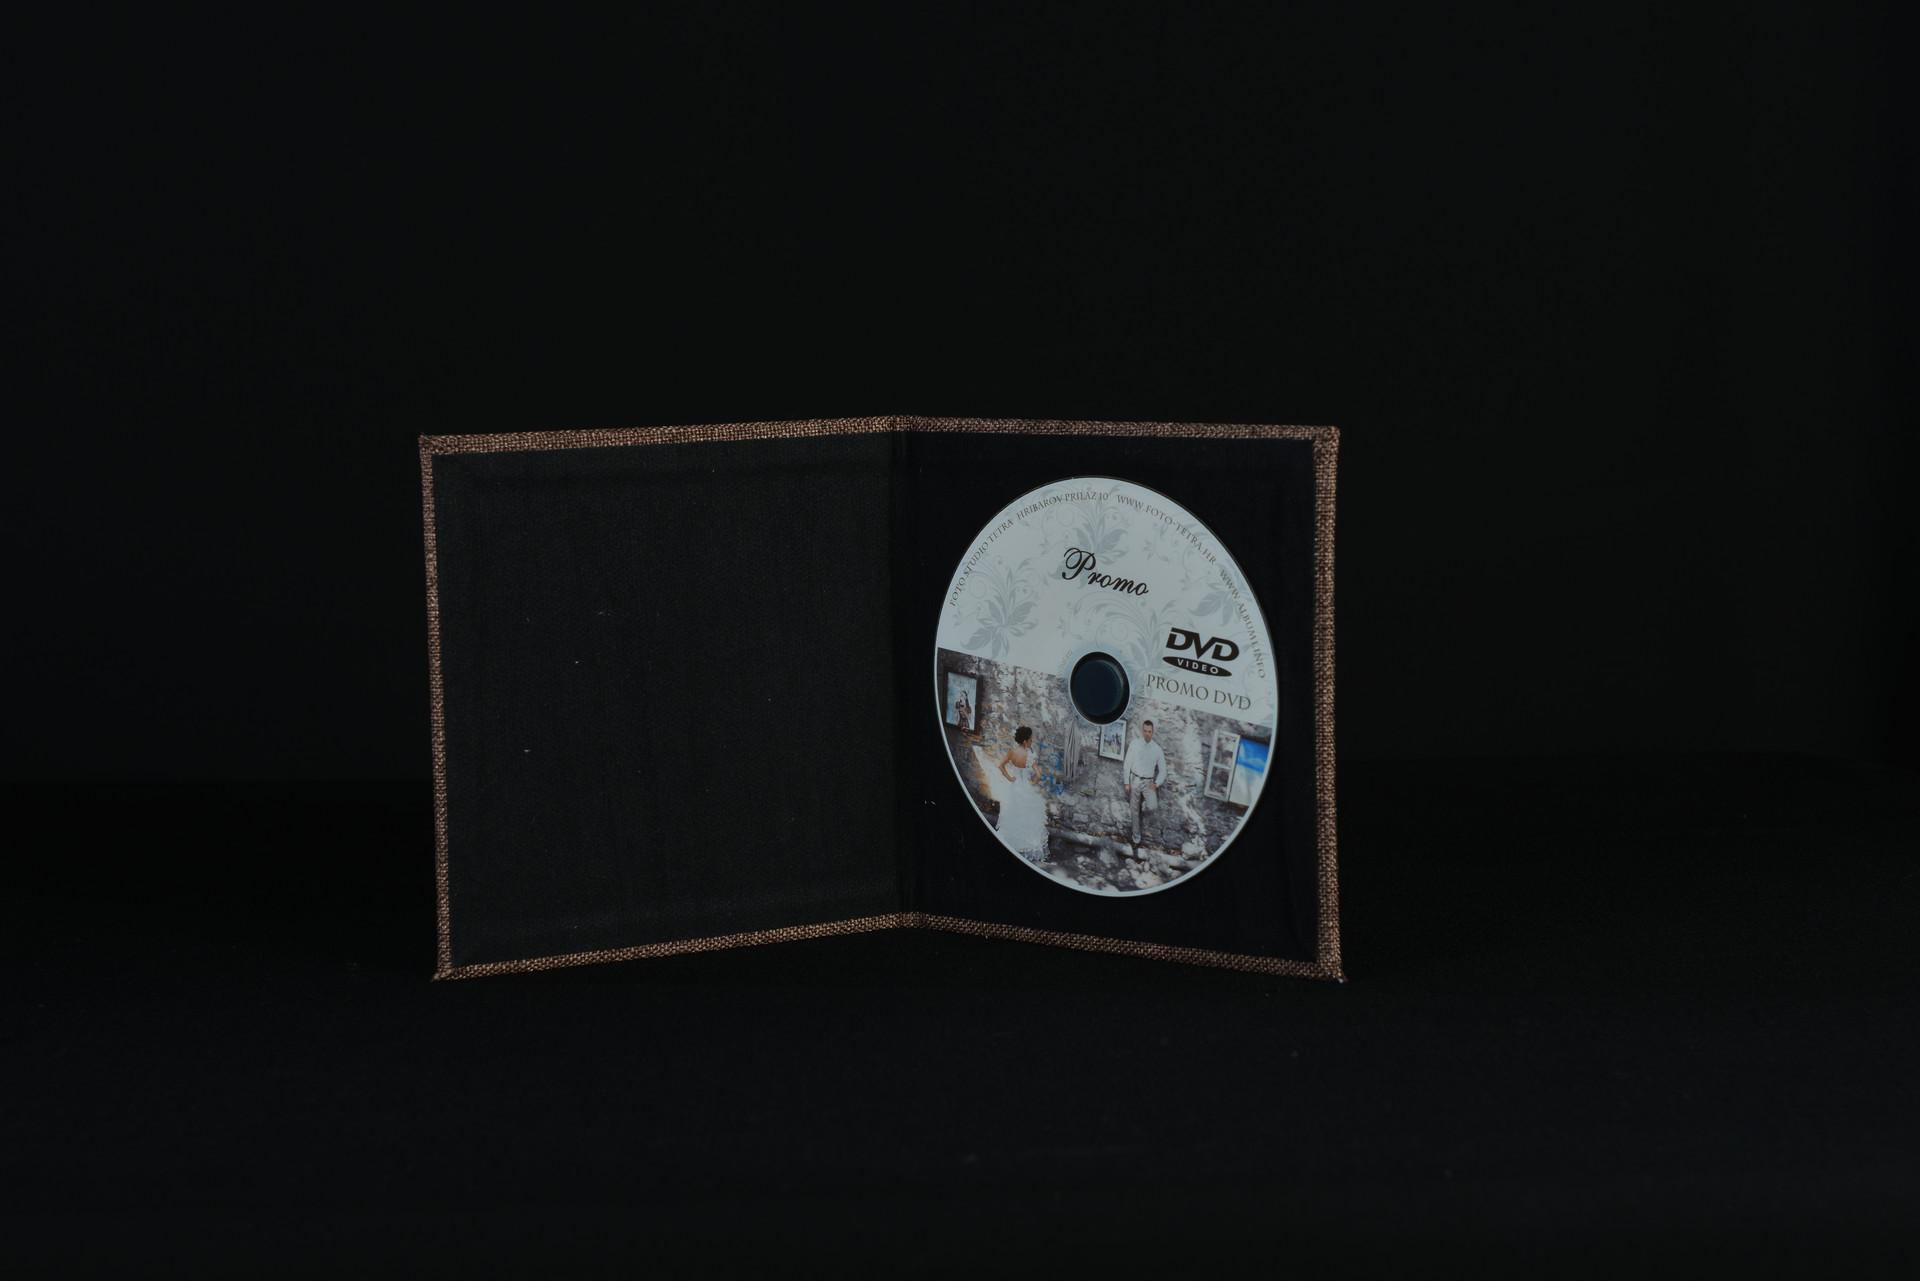 CD/DVD cover   USB cover   Albumi Handicraft